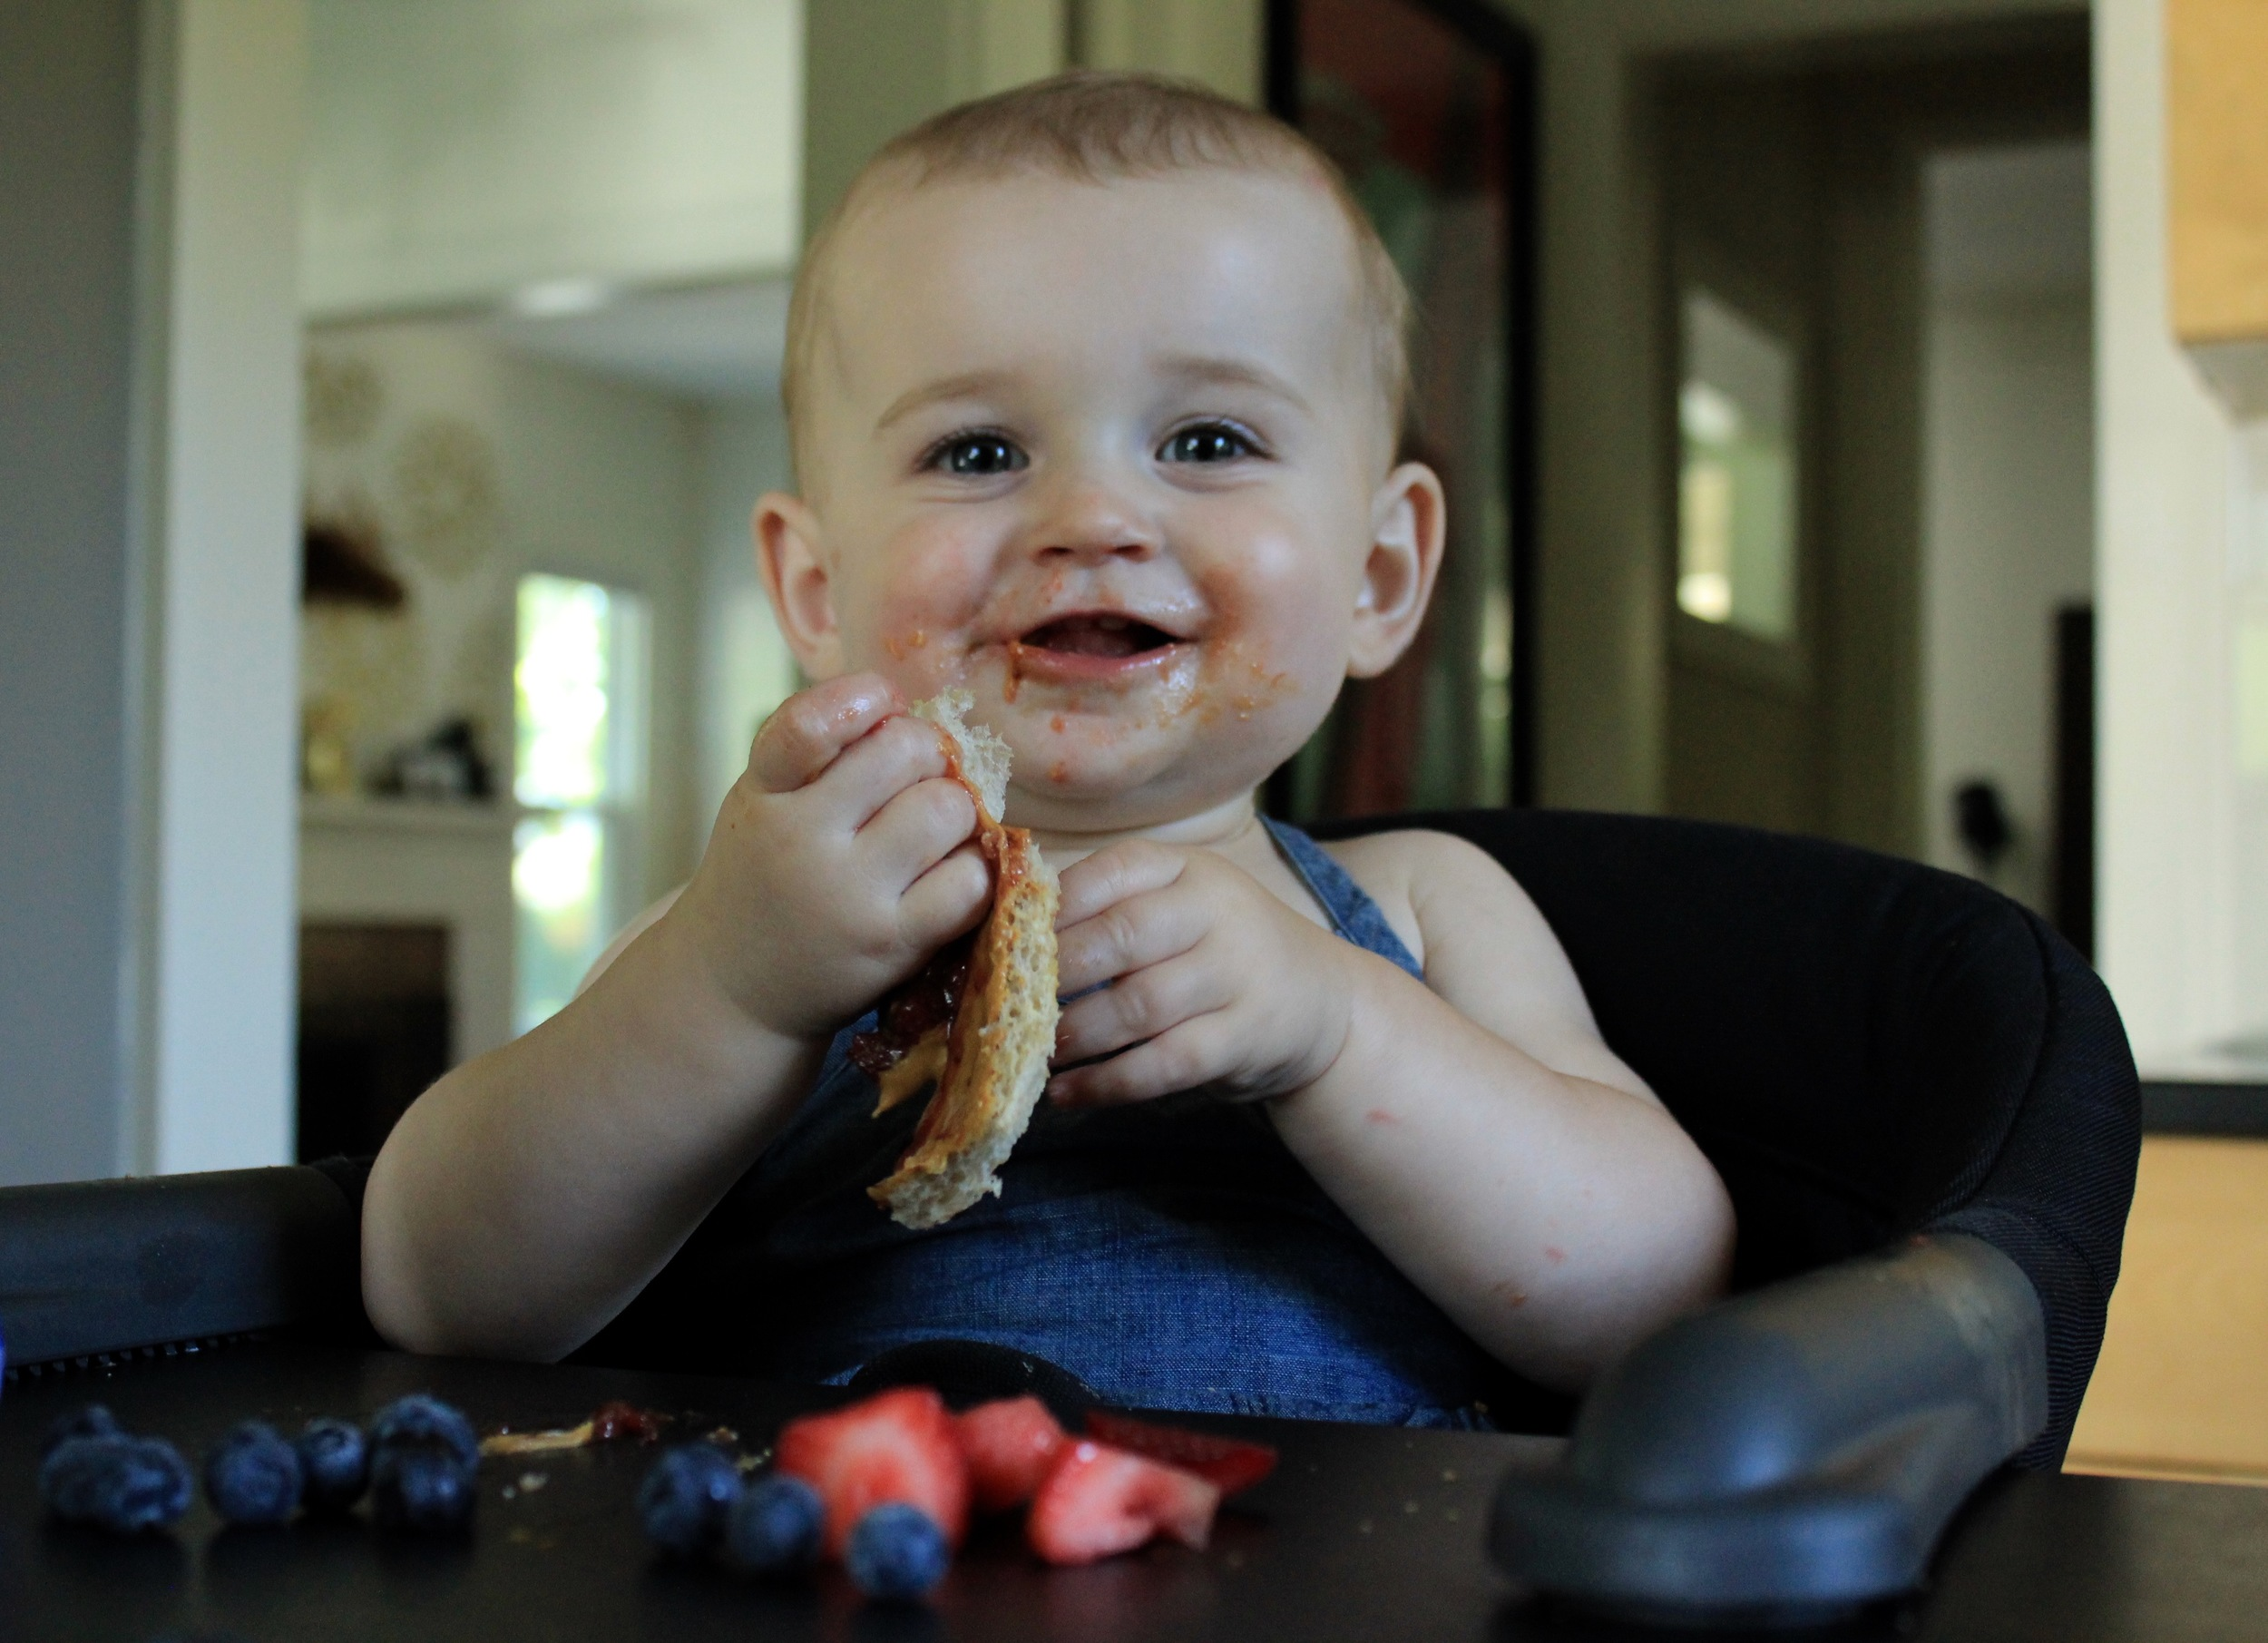 Natalie LOVES peanut butter sandwiches. A Lot.